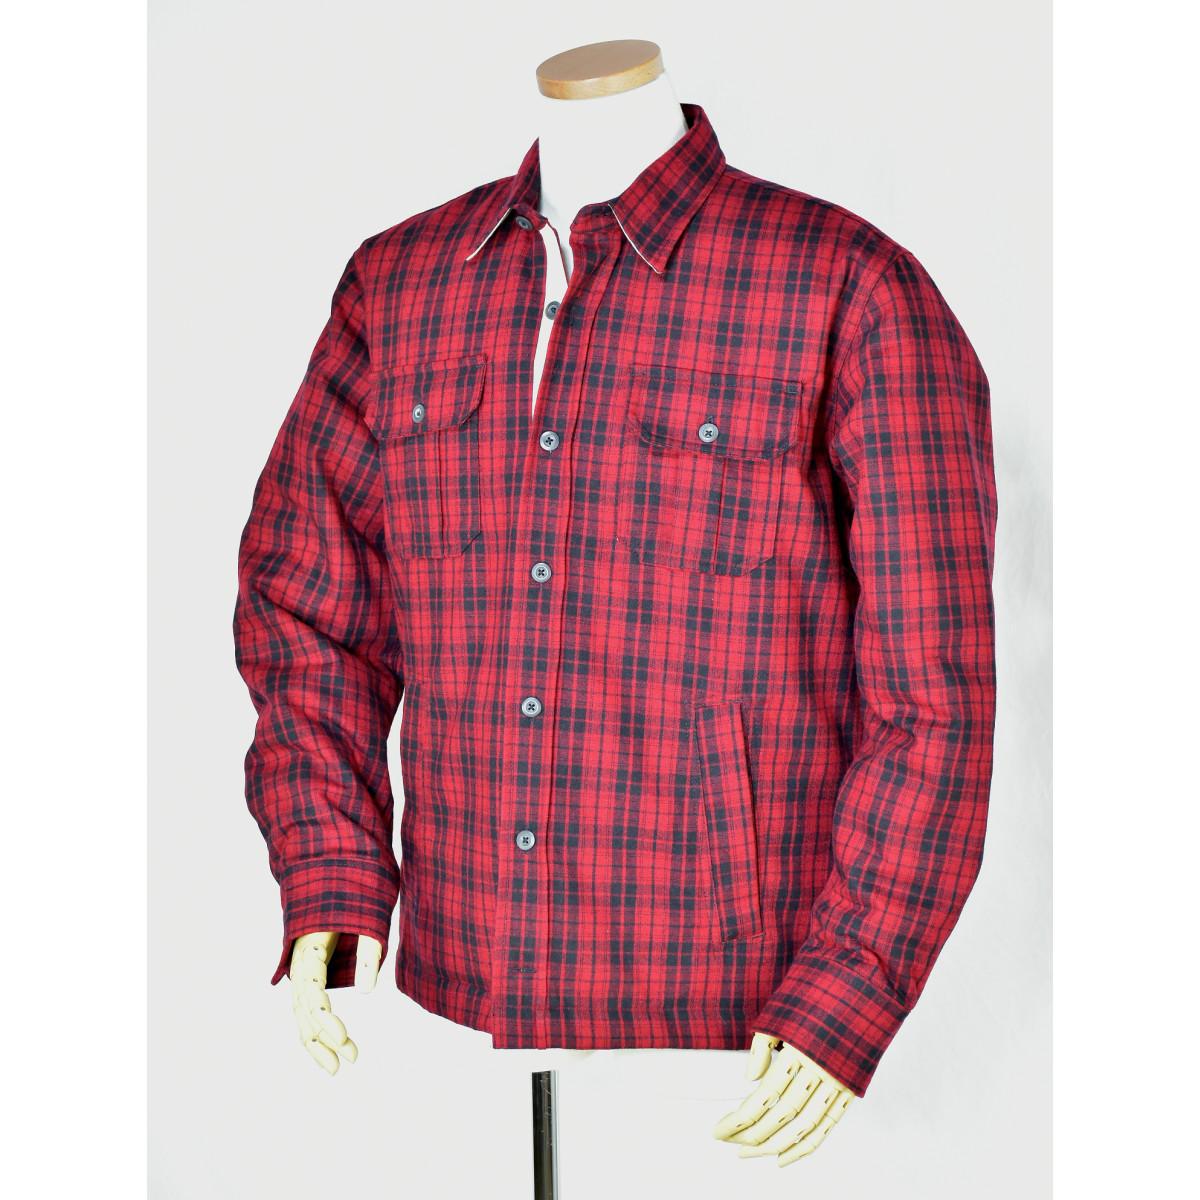 TOMMY HILFIGERメンズ トミーフィルフィガーウール中綿入りシャツジャケット